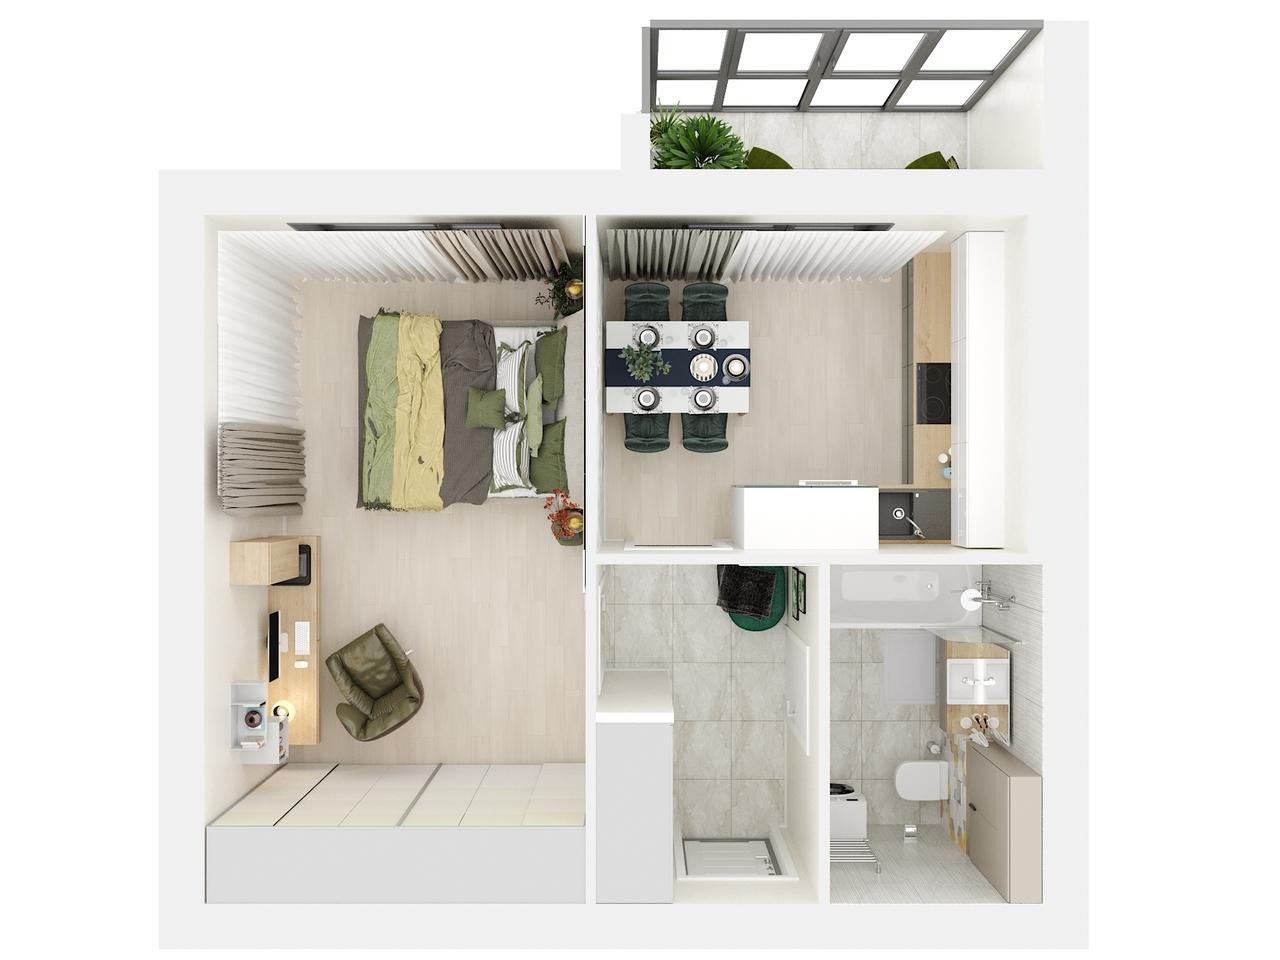 Дом 3 - 1-комнатная квартира №3